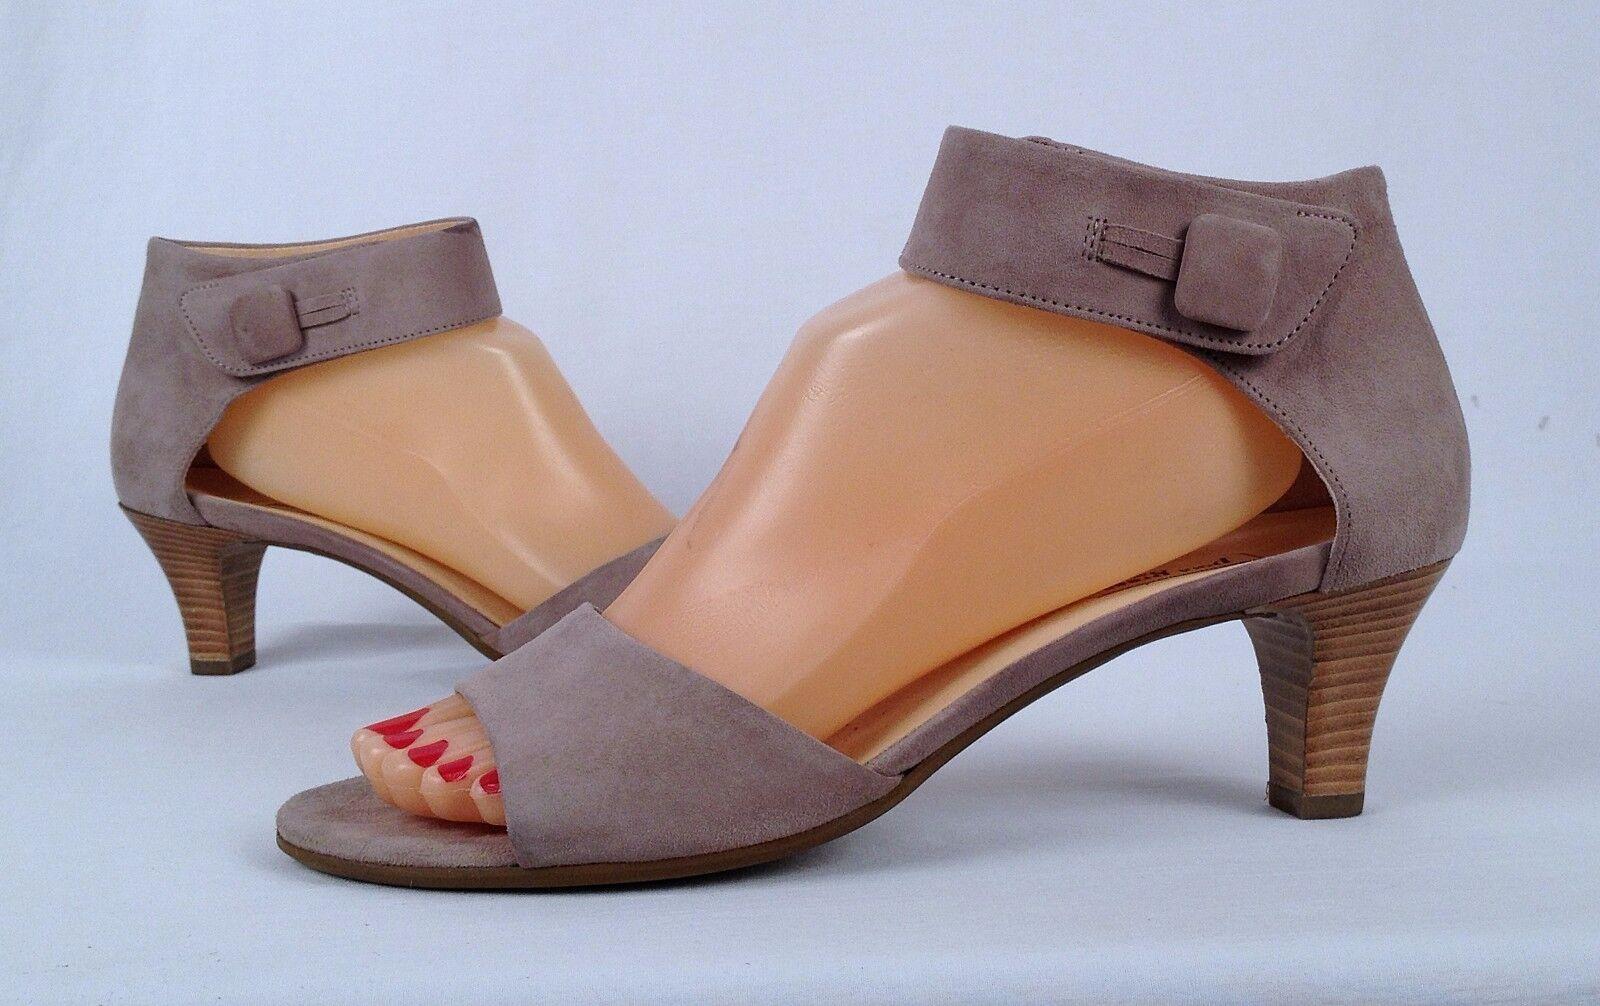 Paul Green- 'Aurora' Sandal -Sand Suede-Size US 9.5/ Aus 7  (03)